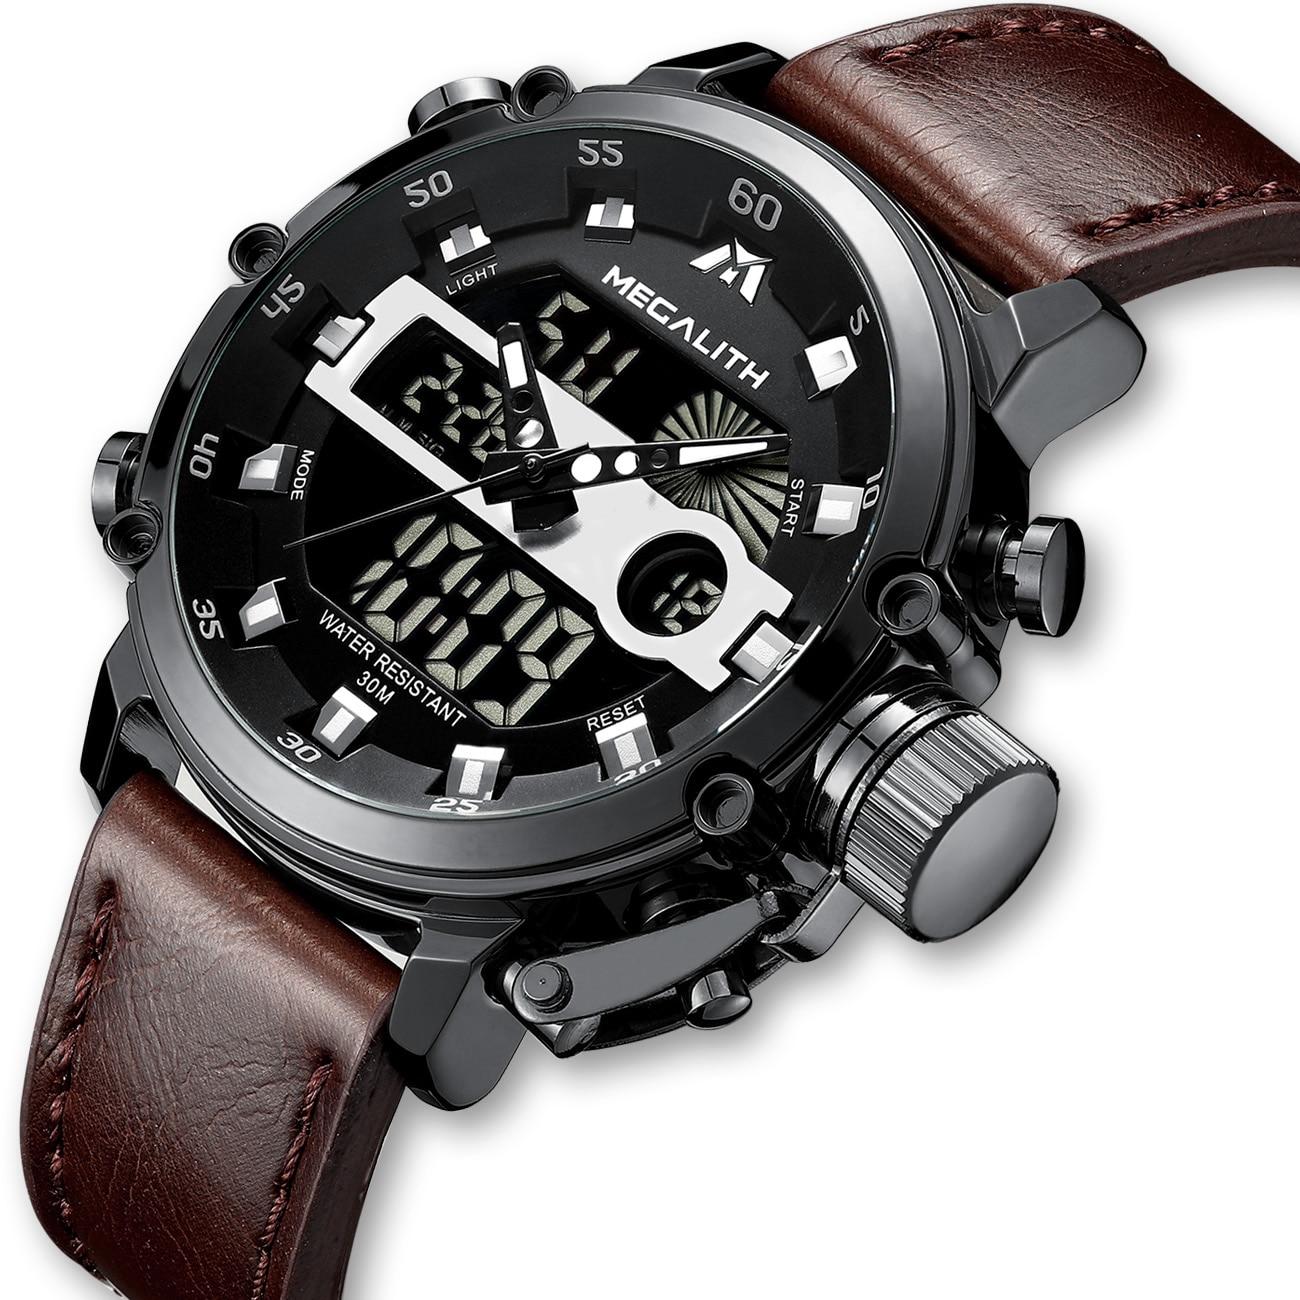 MEGALITH Fashion Men's LED Quartz Watch Men Military Waterproof Watch Sport Multifunction Wrist Watch Men Clock Horloges Mannen